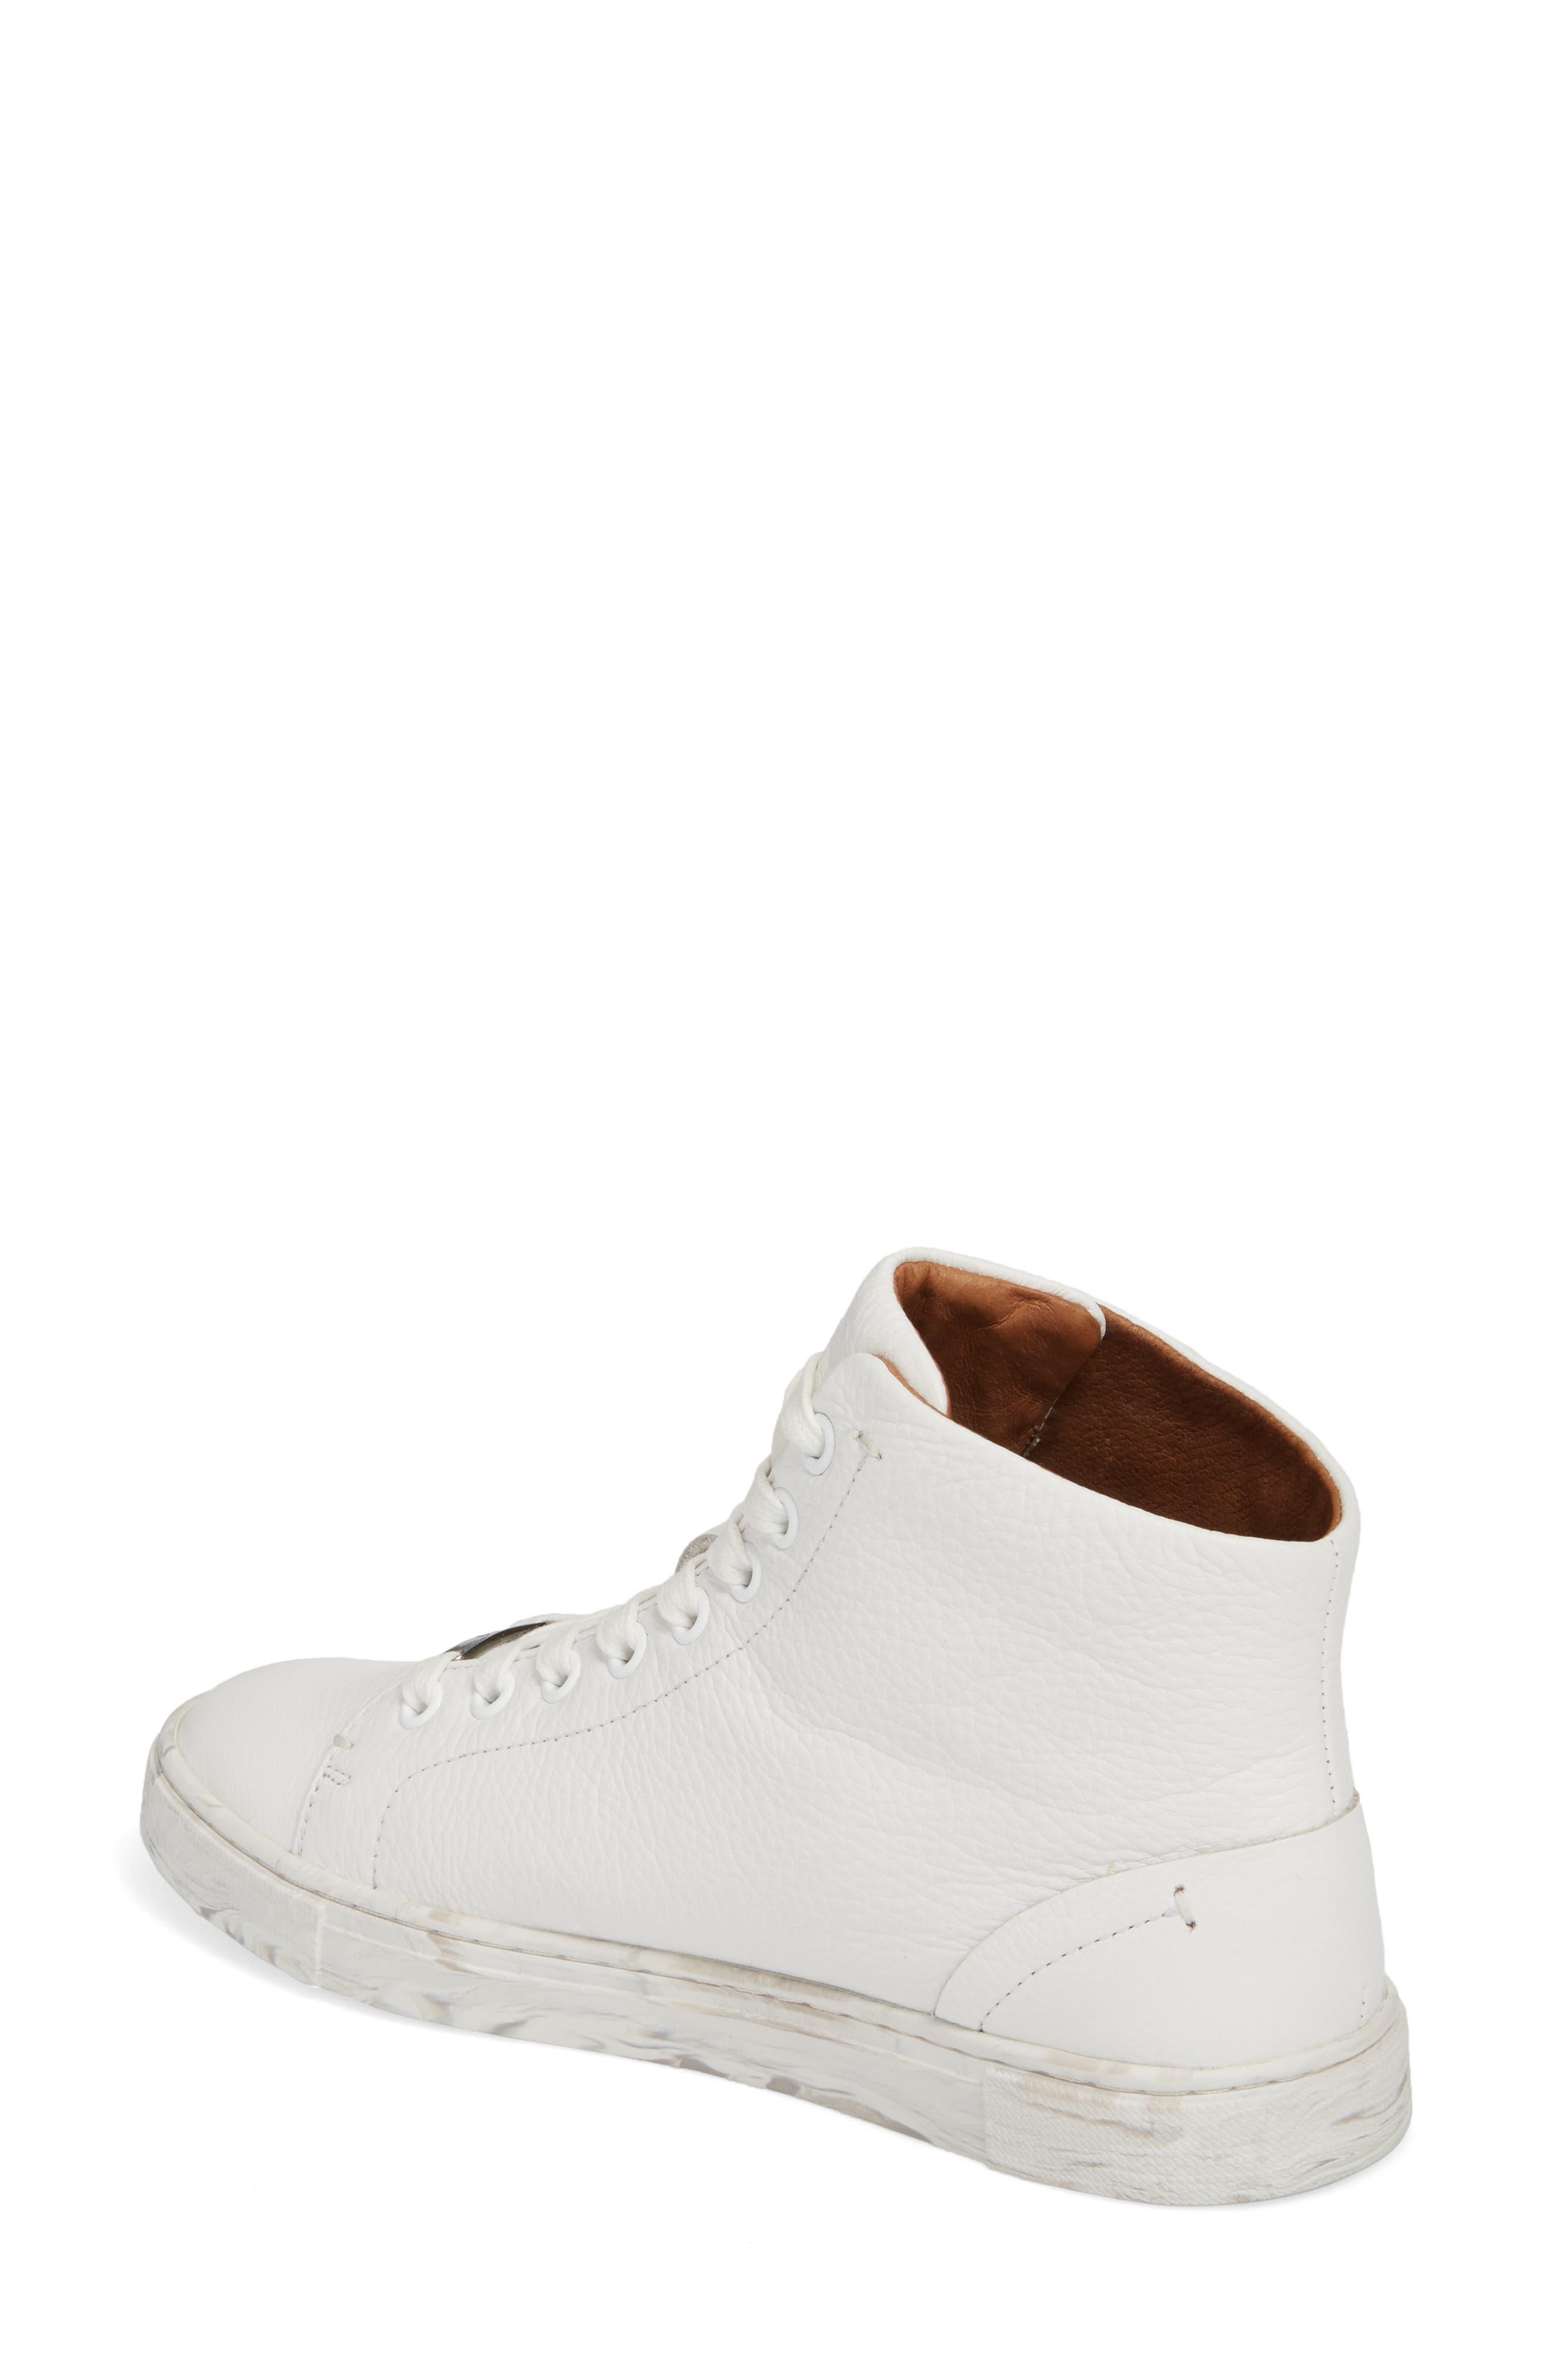 Alternate Image 2  - Frye Ivy High Top Sneaker (Women)